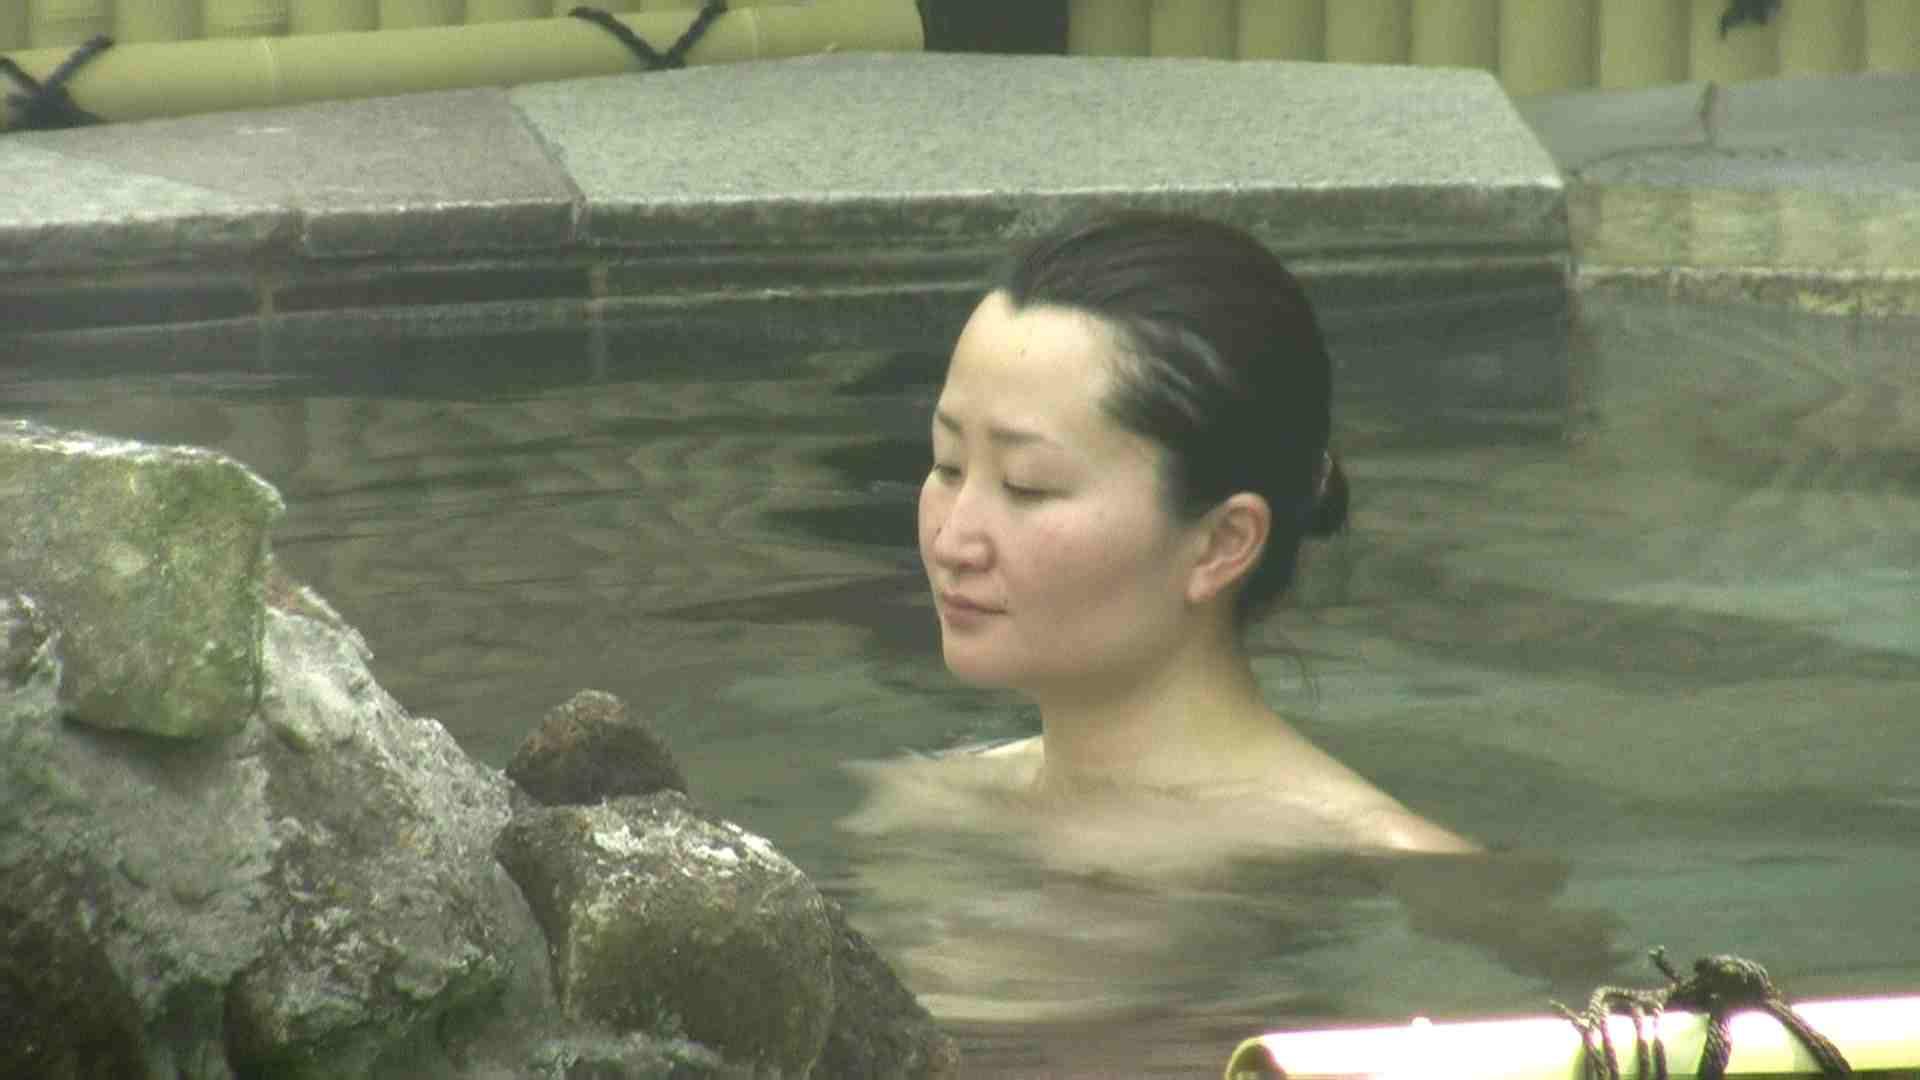 Aquaな露天風呂Vol.632 露天 戯れ無修正画像 70画像 26